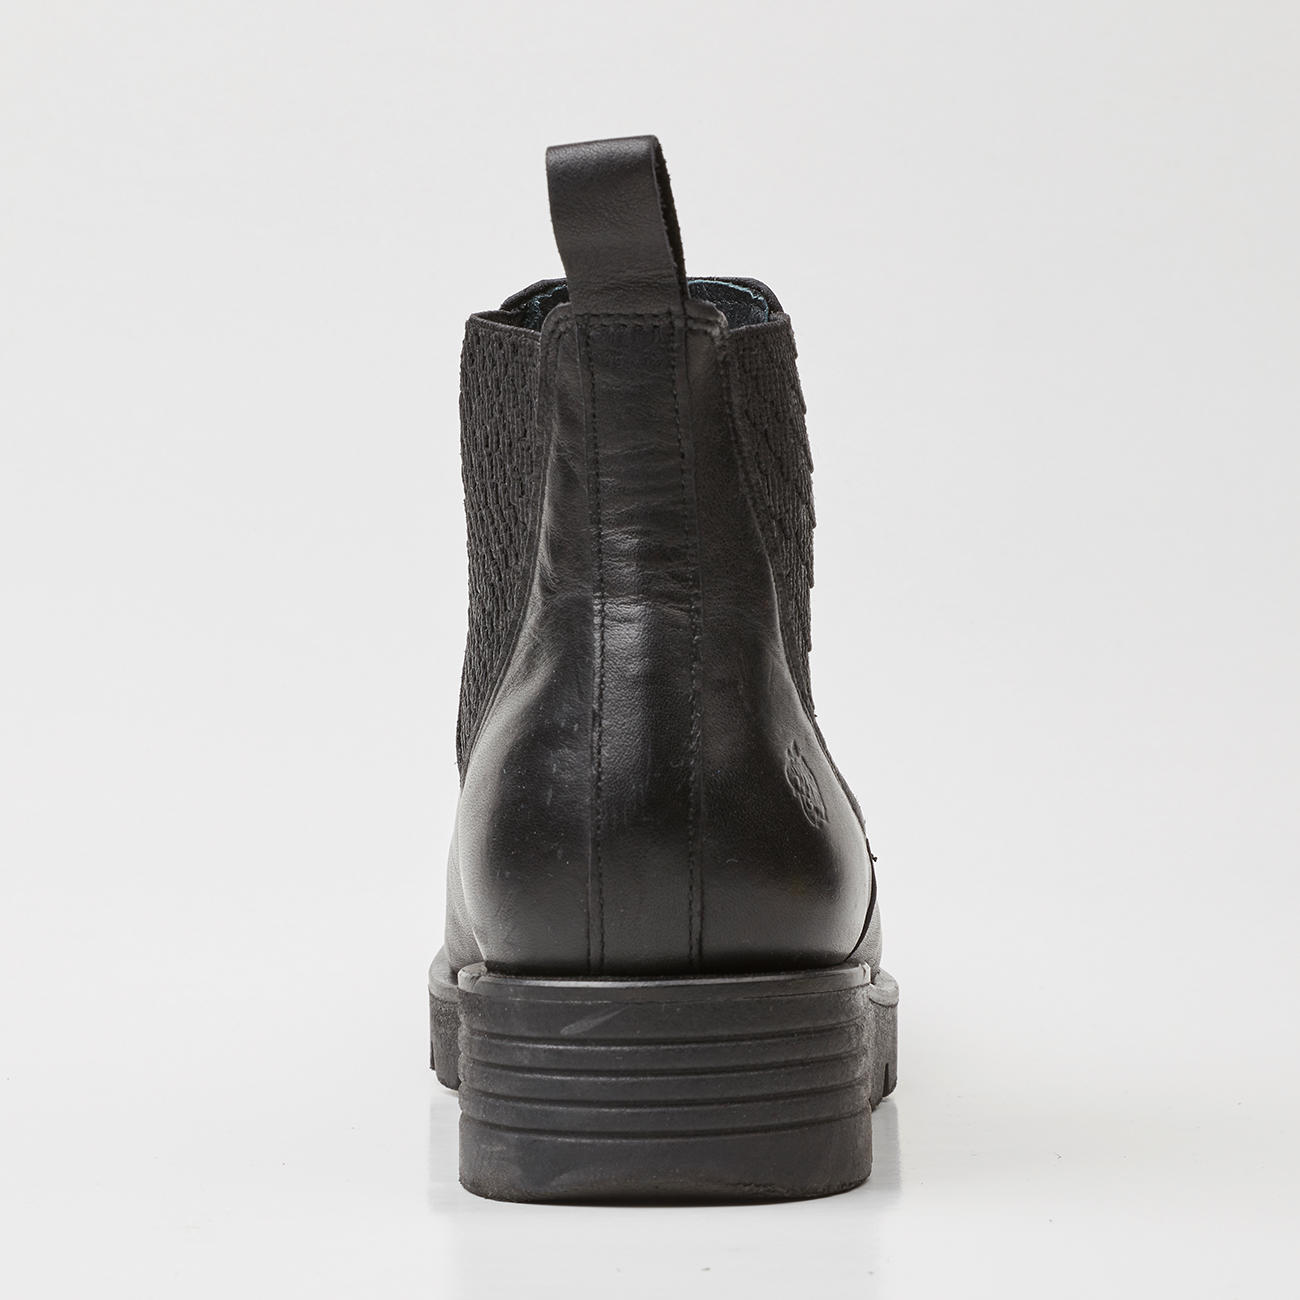 buy online 036ed 5c525 Apple of Eden Chelsea Boots   Discover classics